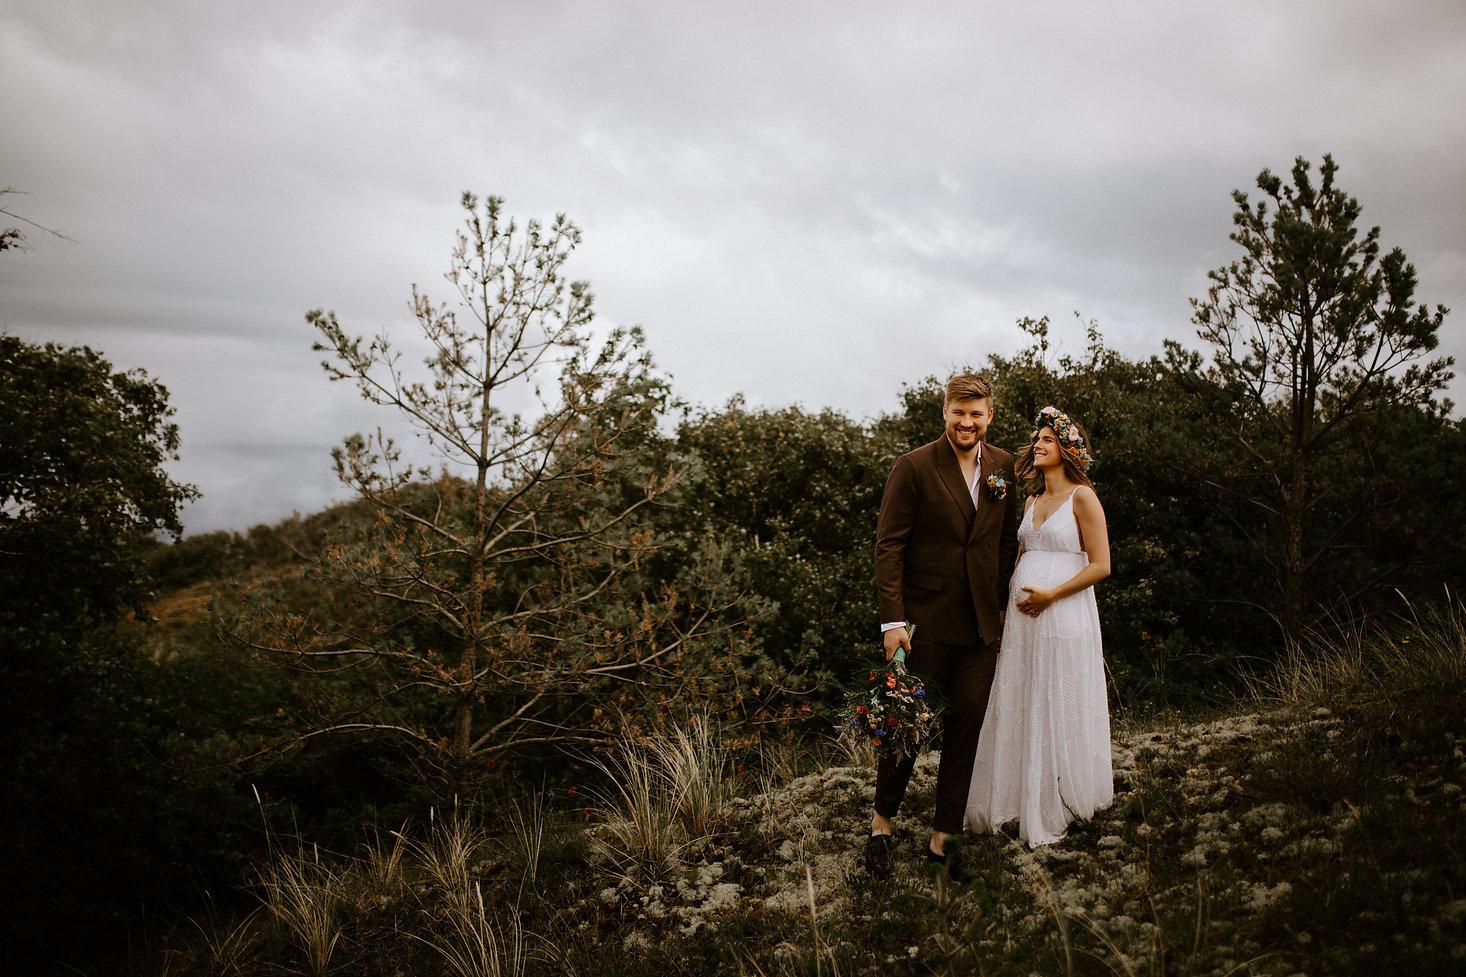 Bohemisk bryllup i naturen